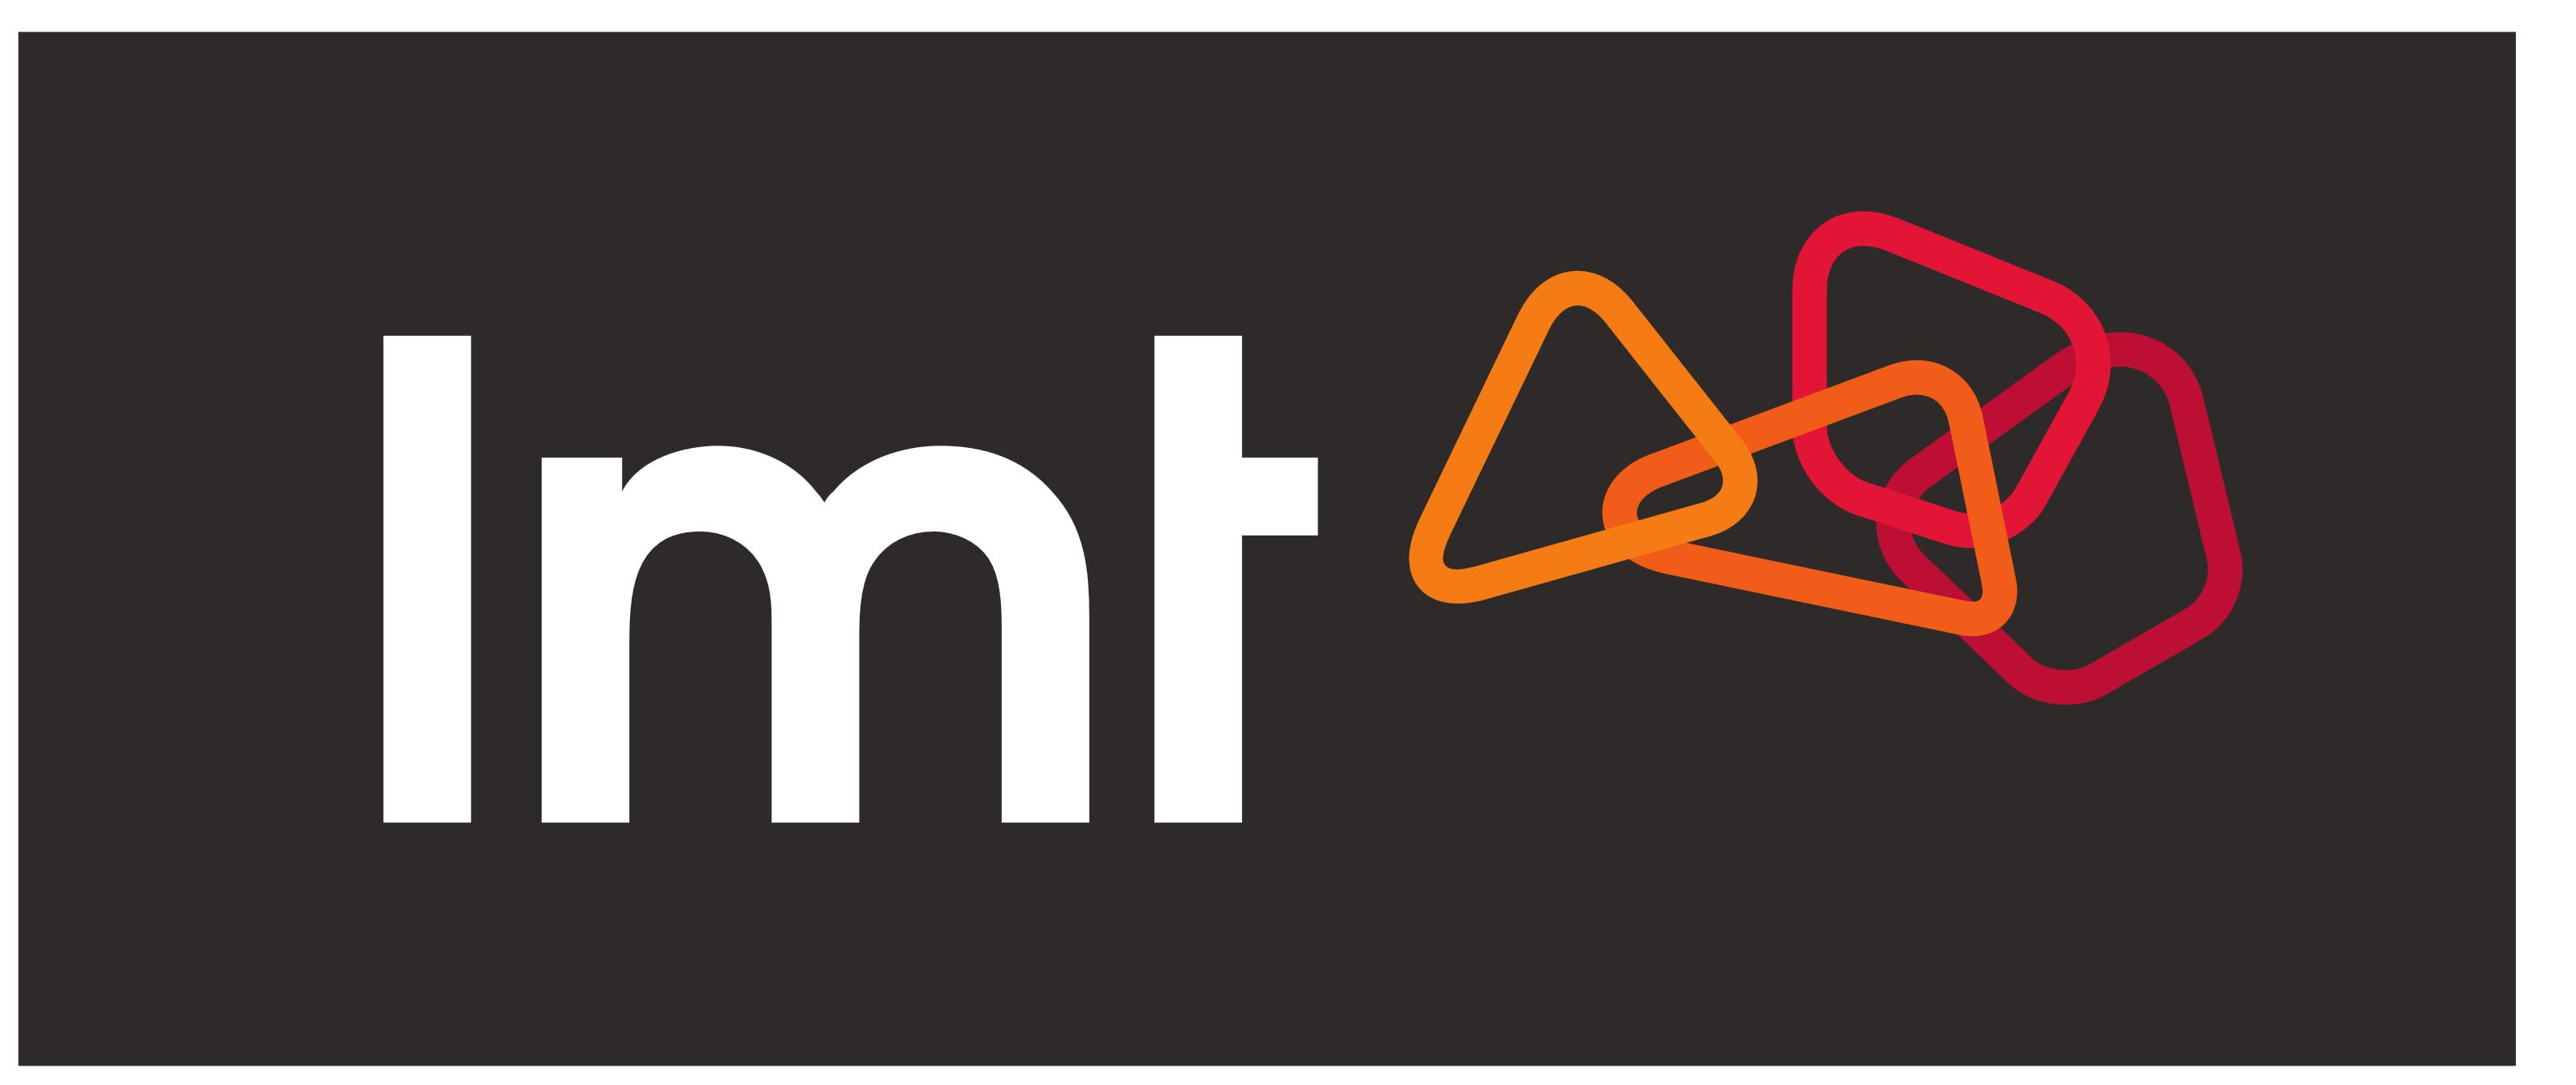 lmt  u2013 logos download